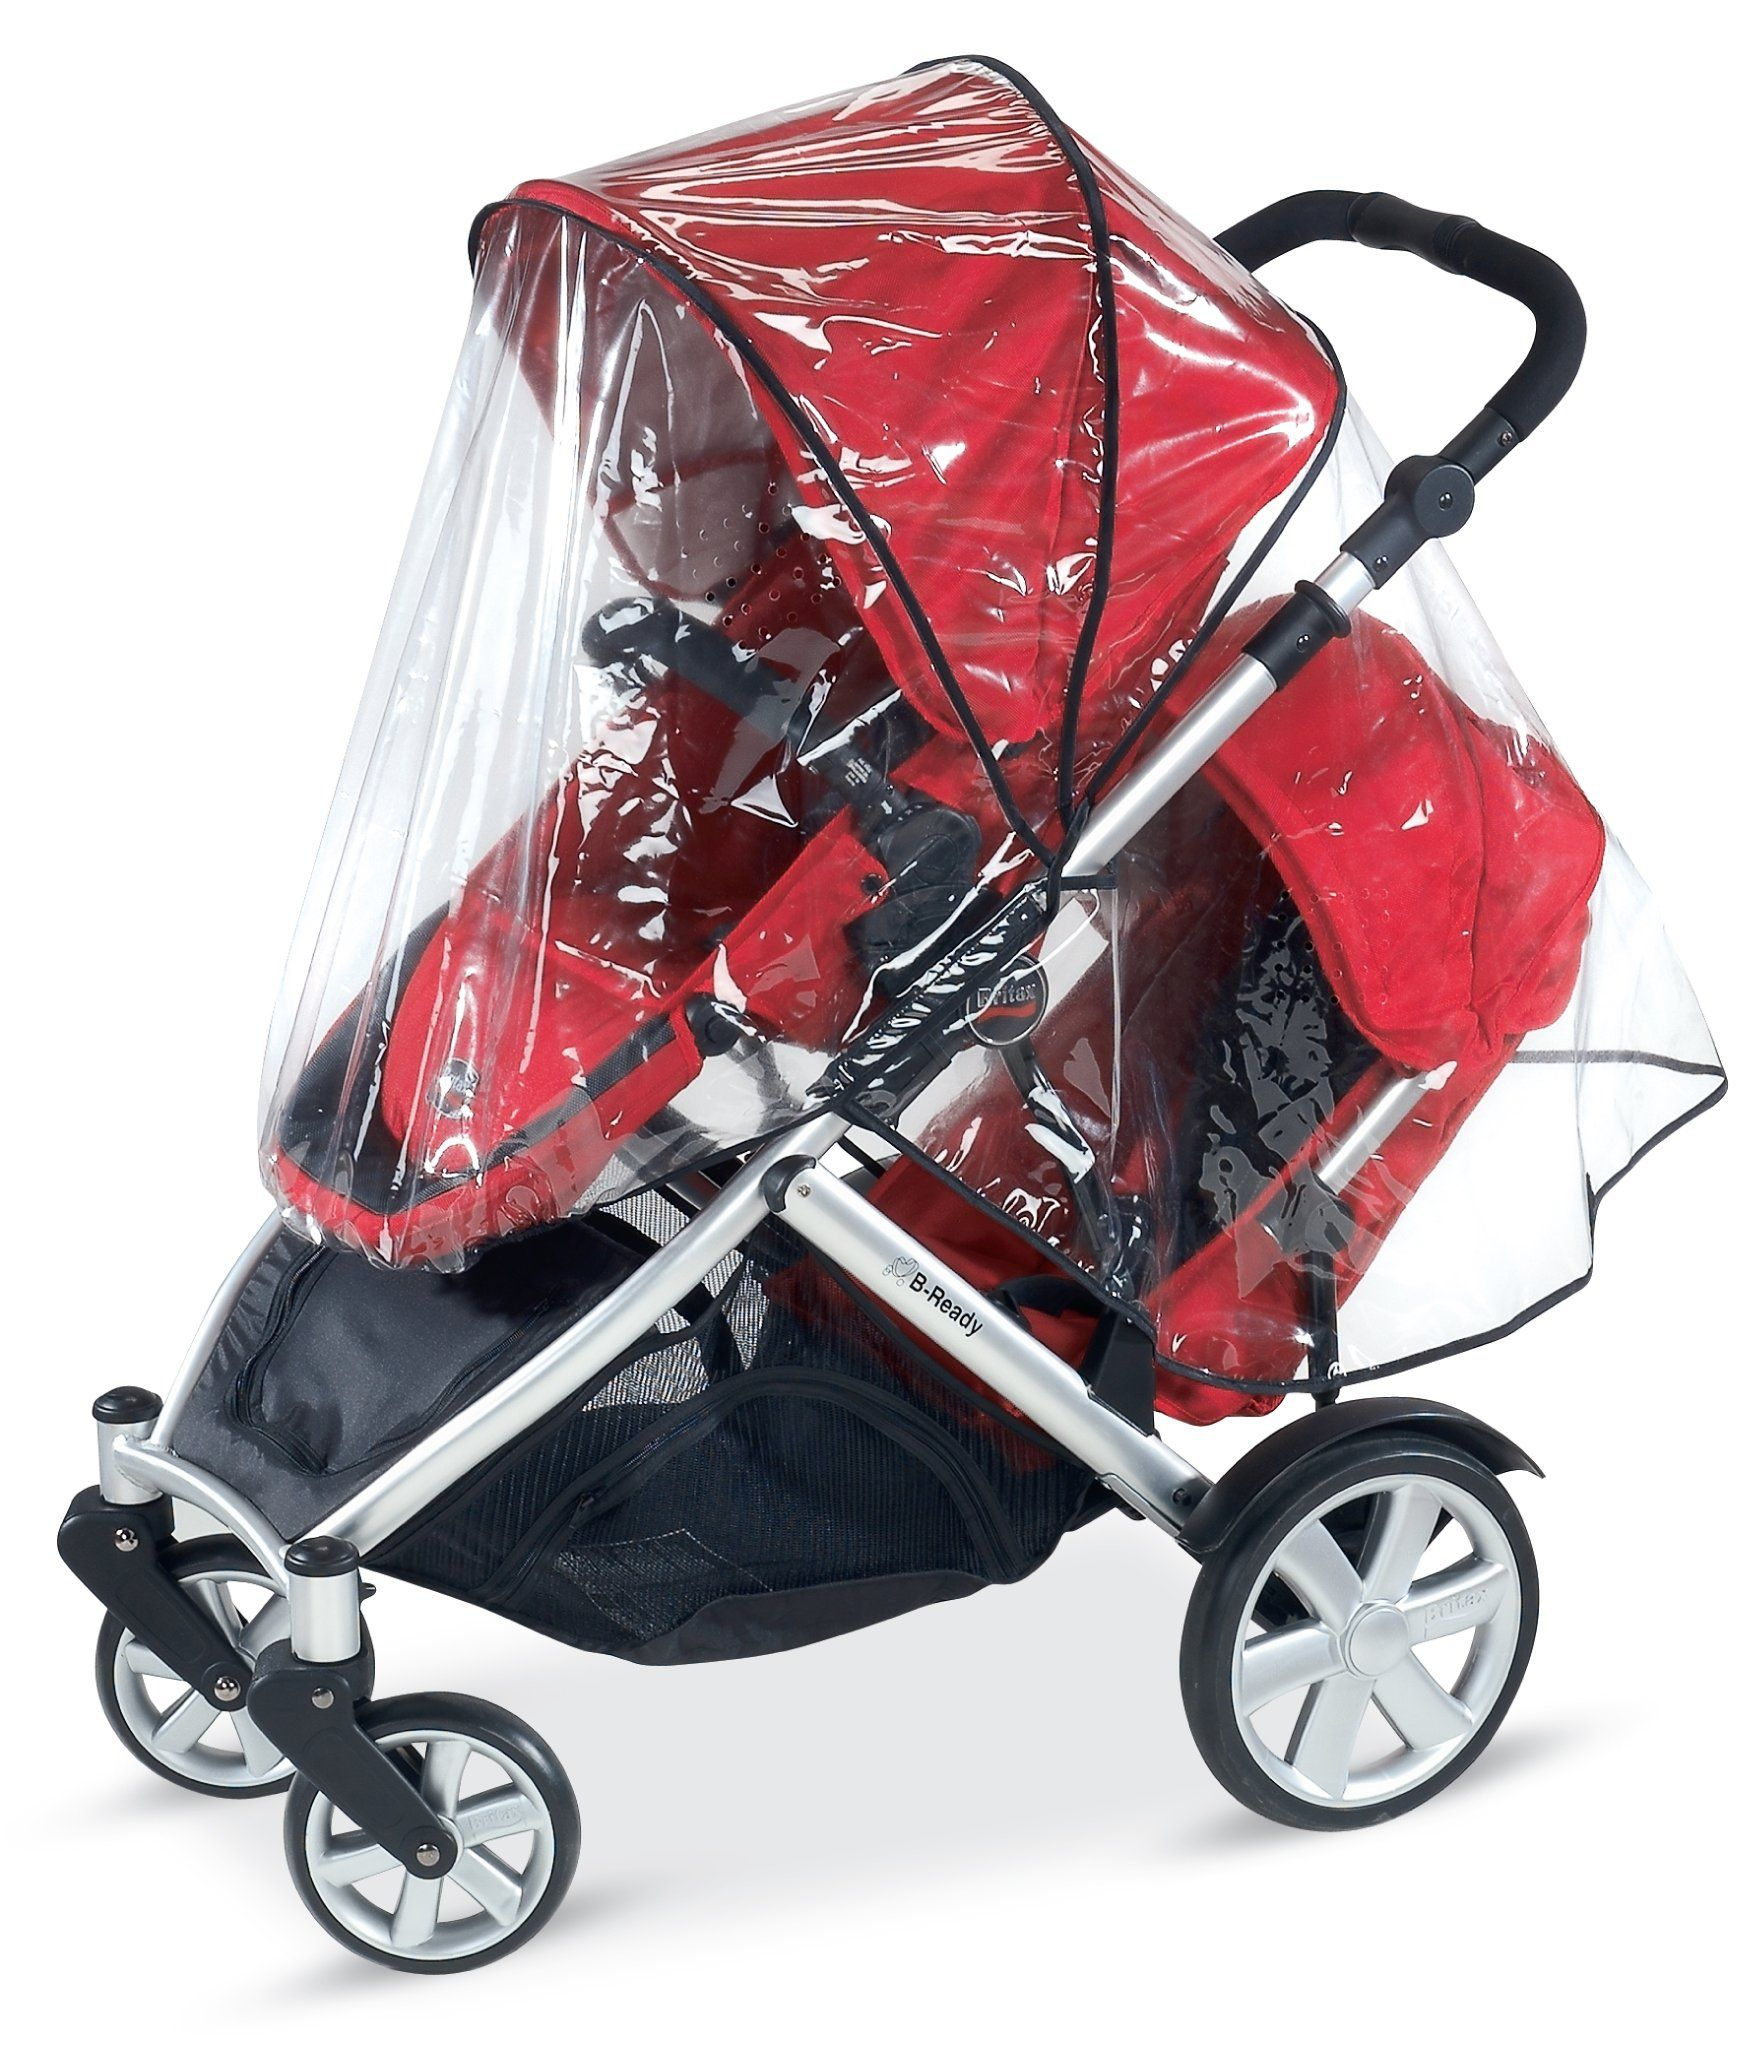 Amazon.com : Britax B-Ready Full Rain Cover : Baby Stroller Weather ...